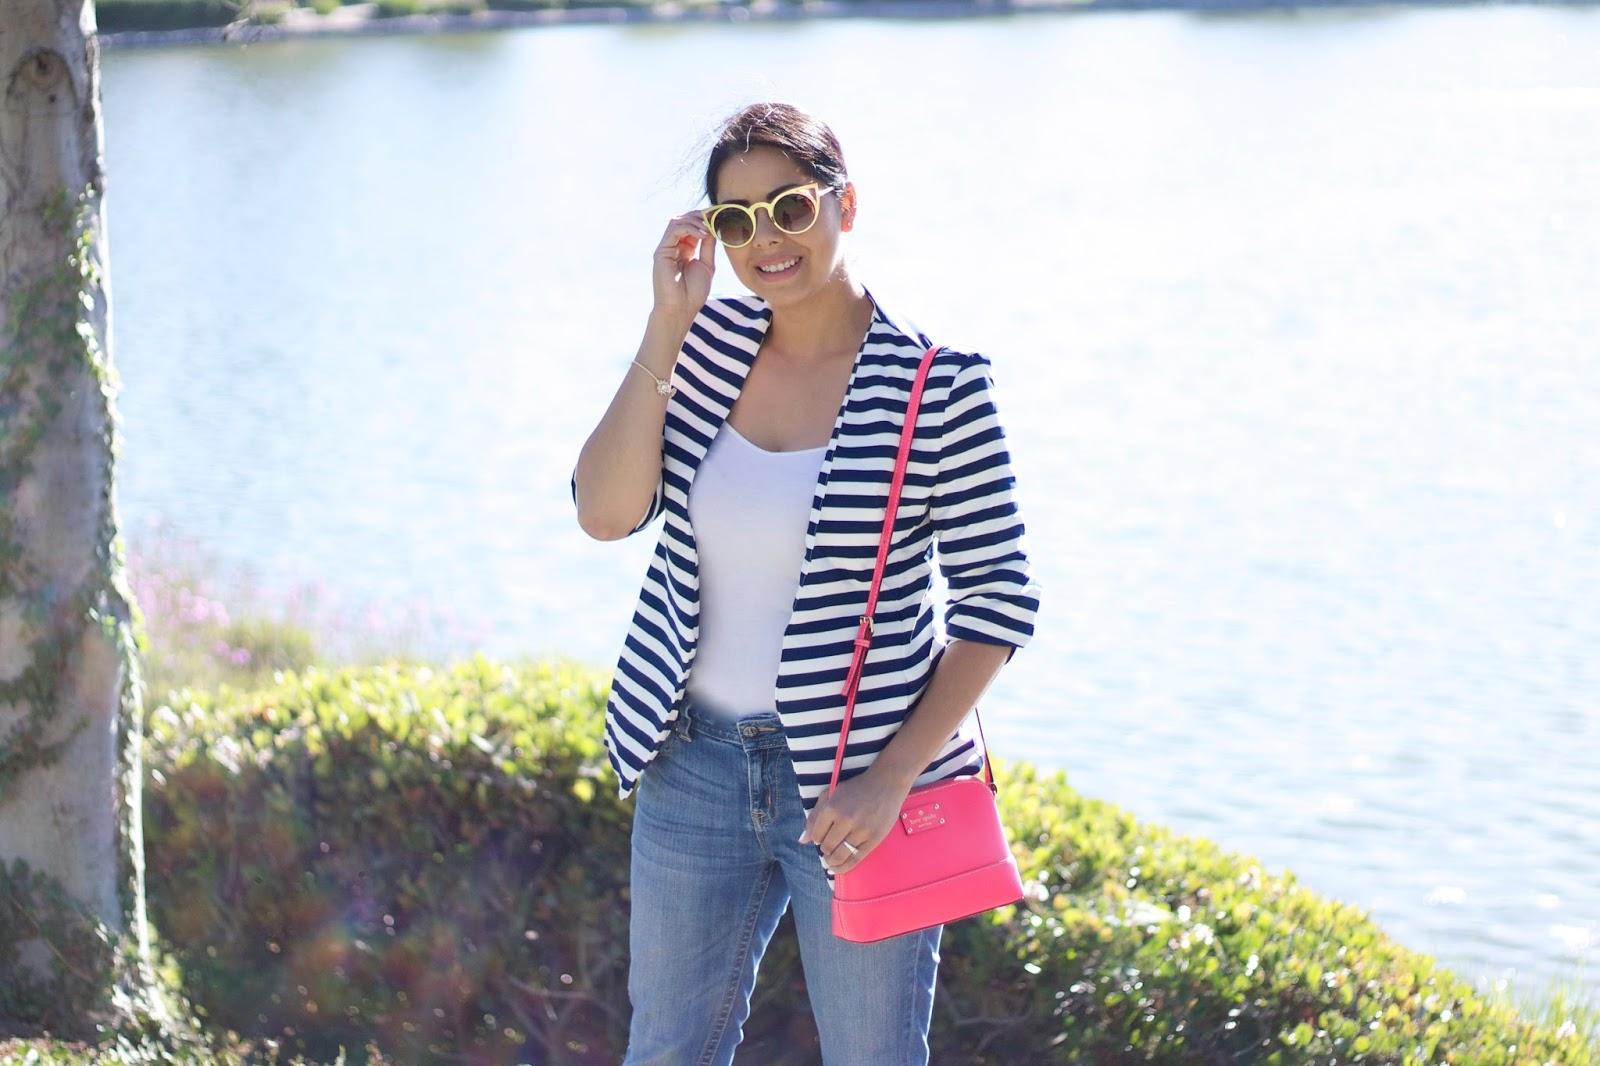 San Diego Style Bloggers, San Diego Style, San Diego Fashion Blogger, SDstyle, quay sunglasses